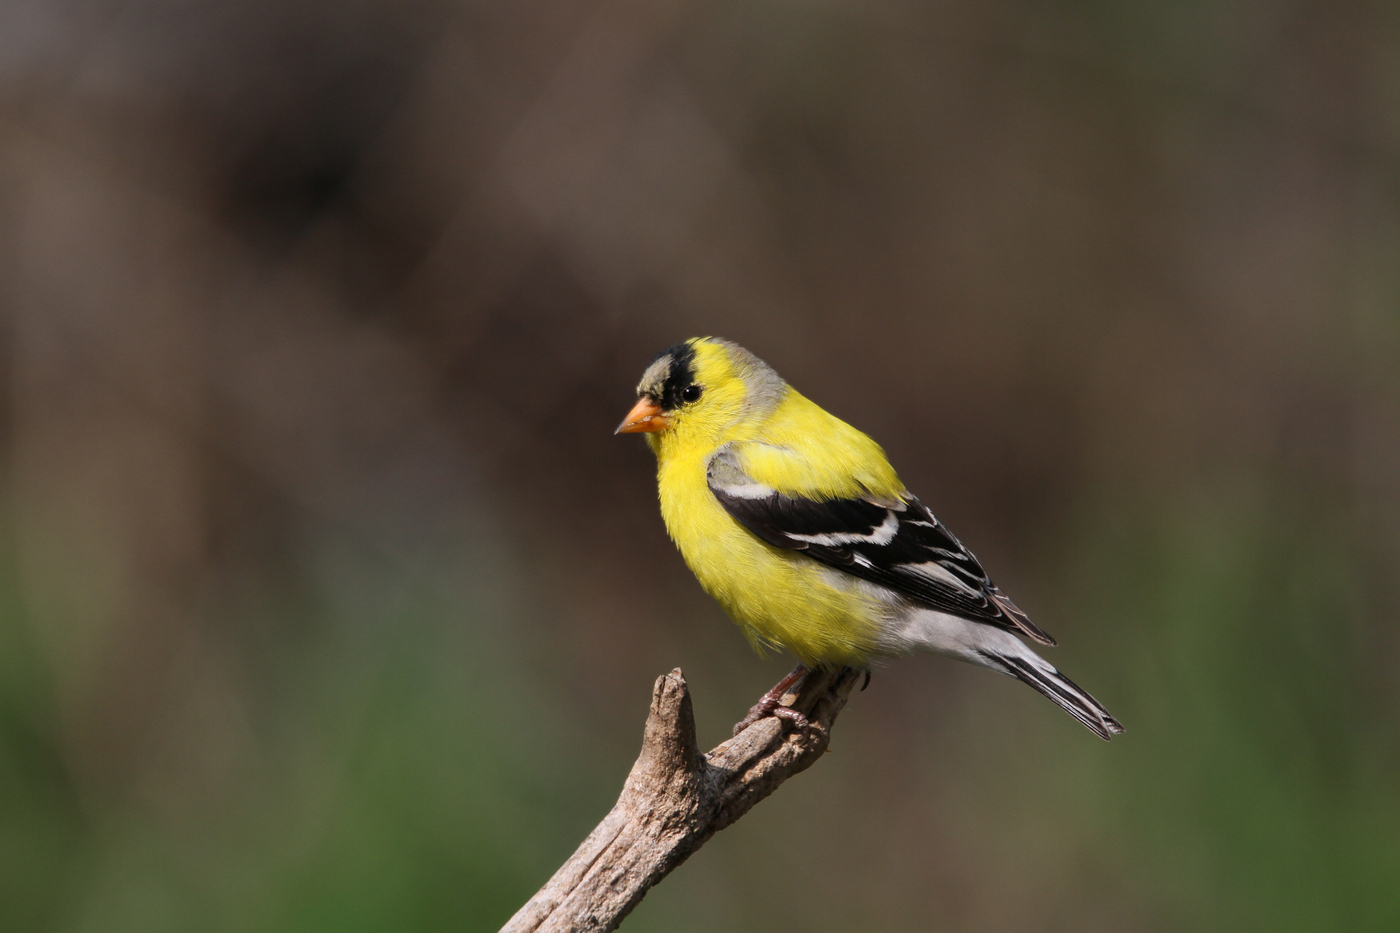 Male Goldfinch #6